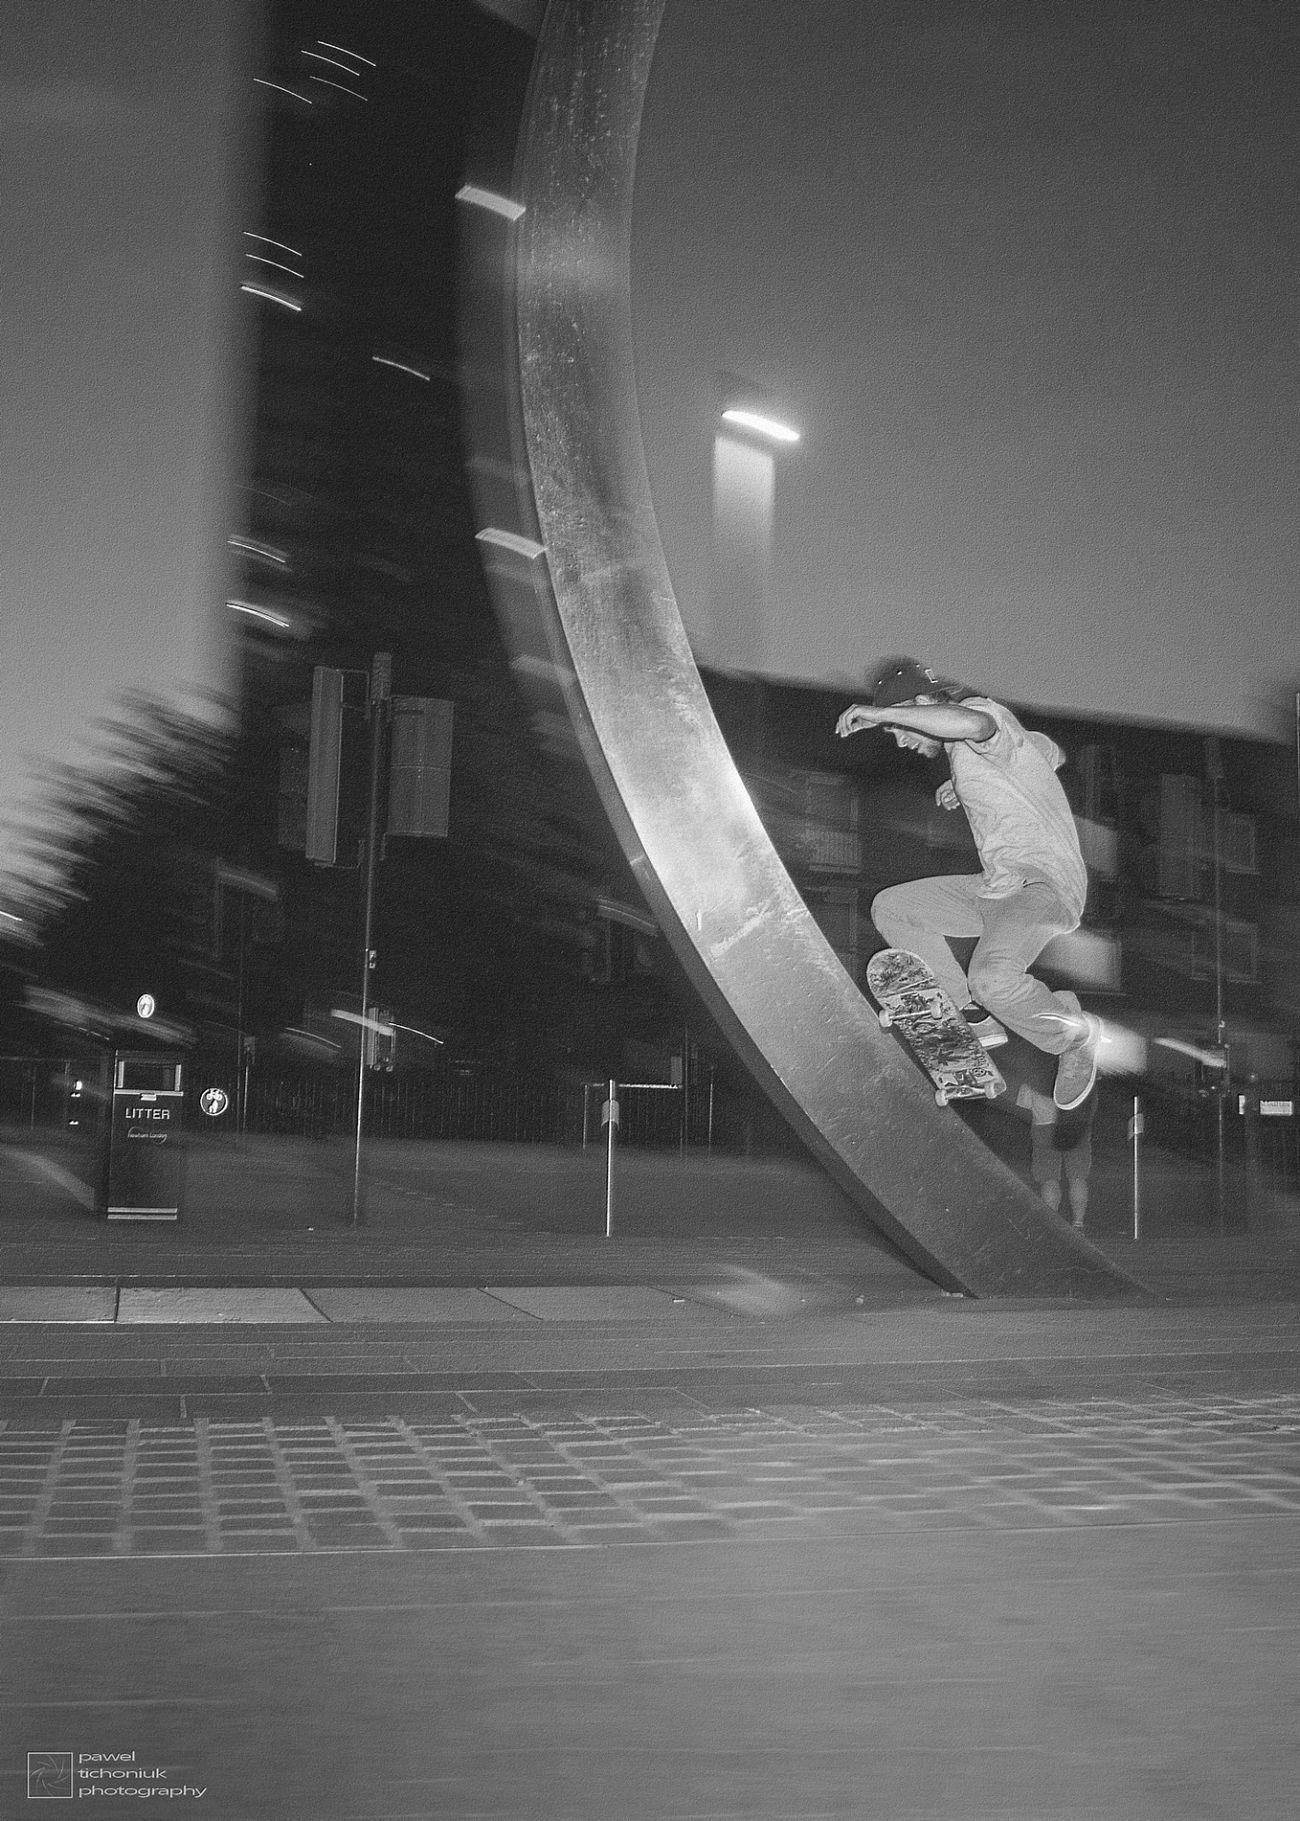 #Black&White #photoshoot  #Skateboard Life No Comply Polishboy  Sport Man